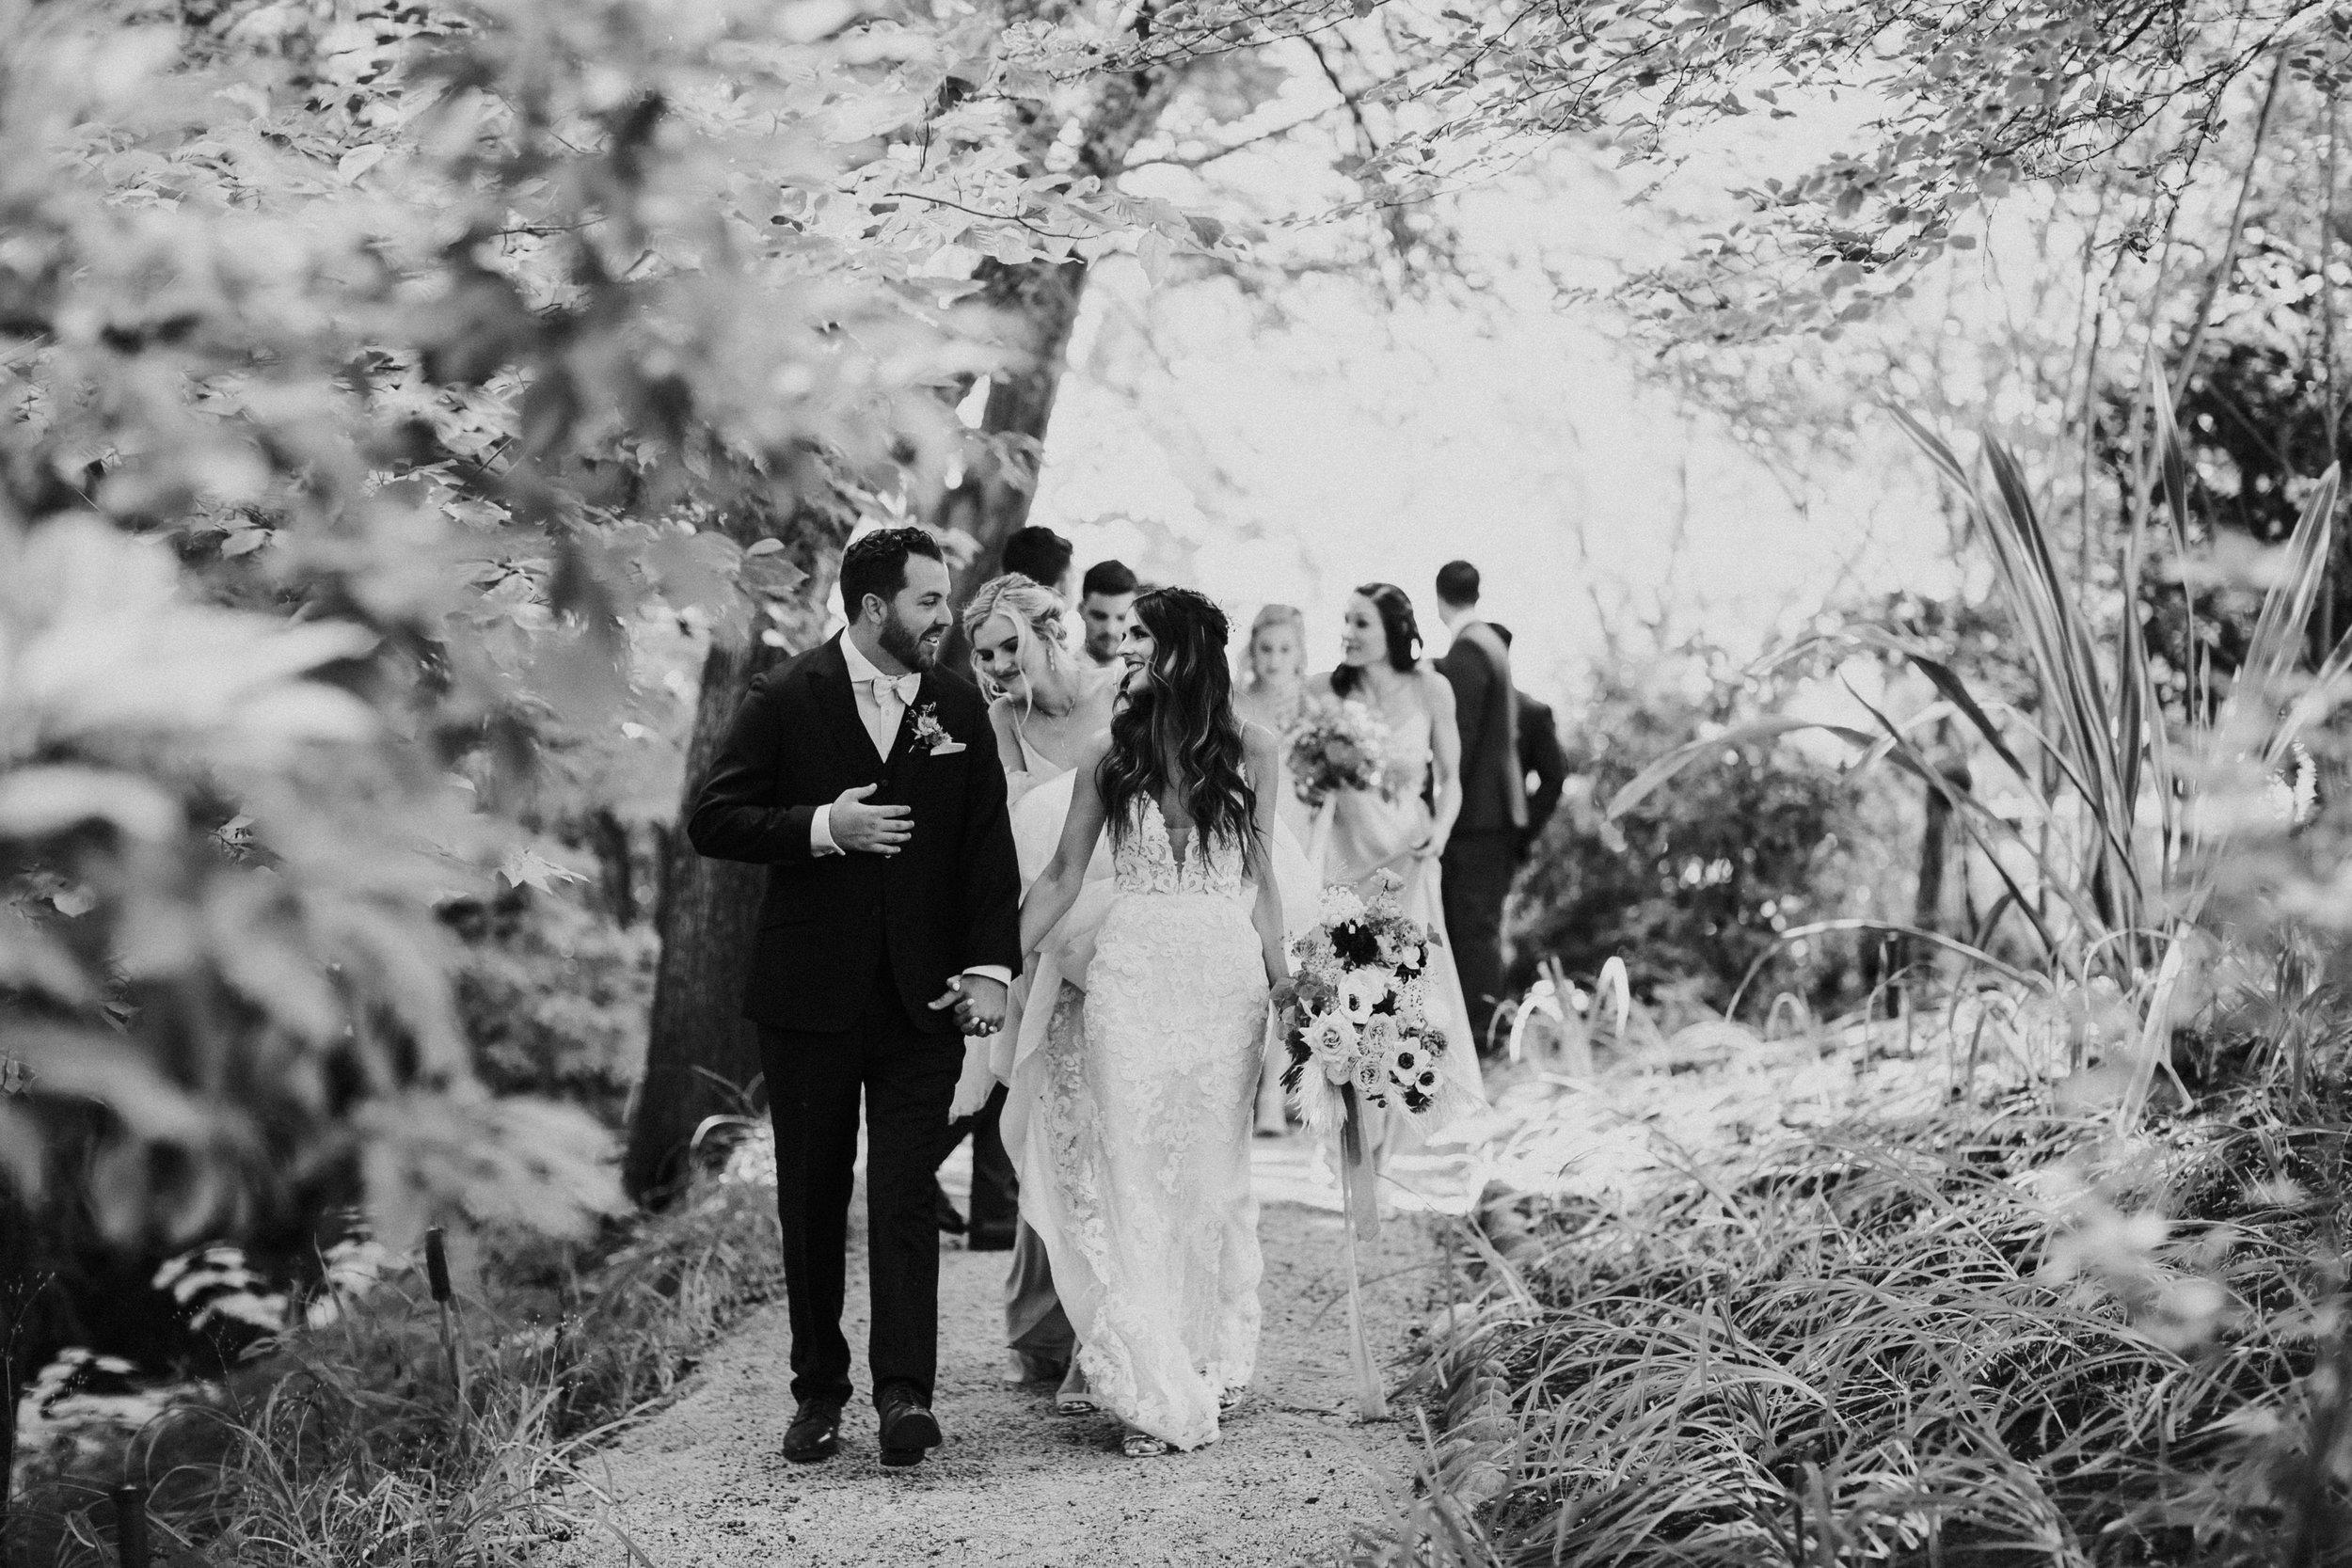 lyndiashtonwedding-413.jpg